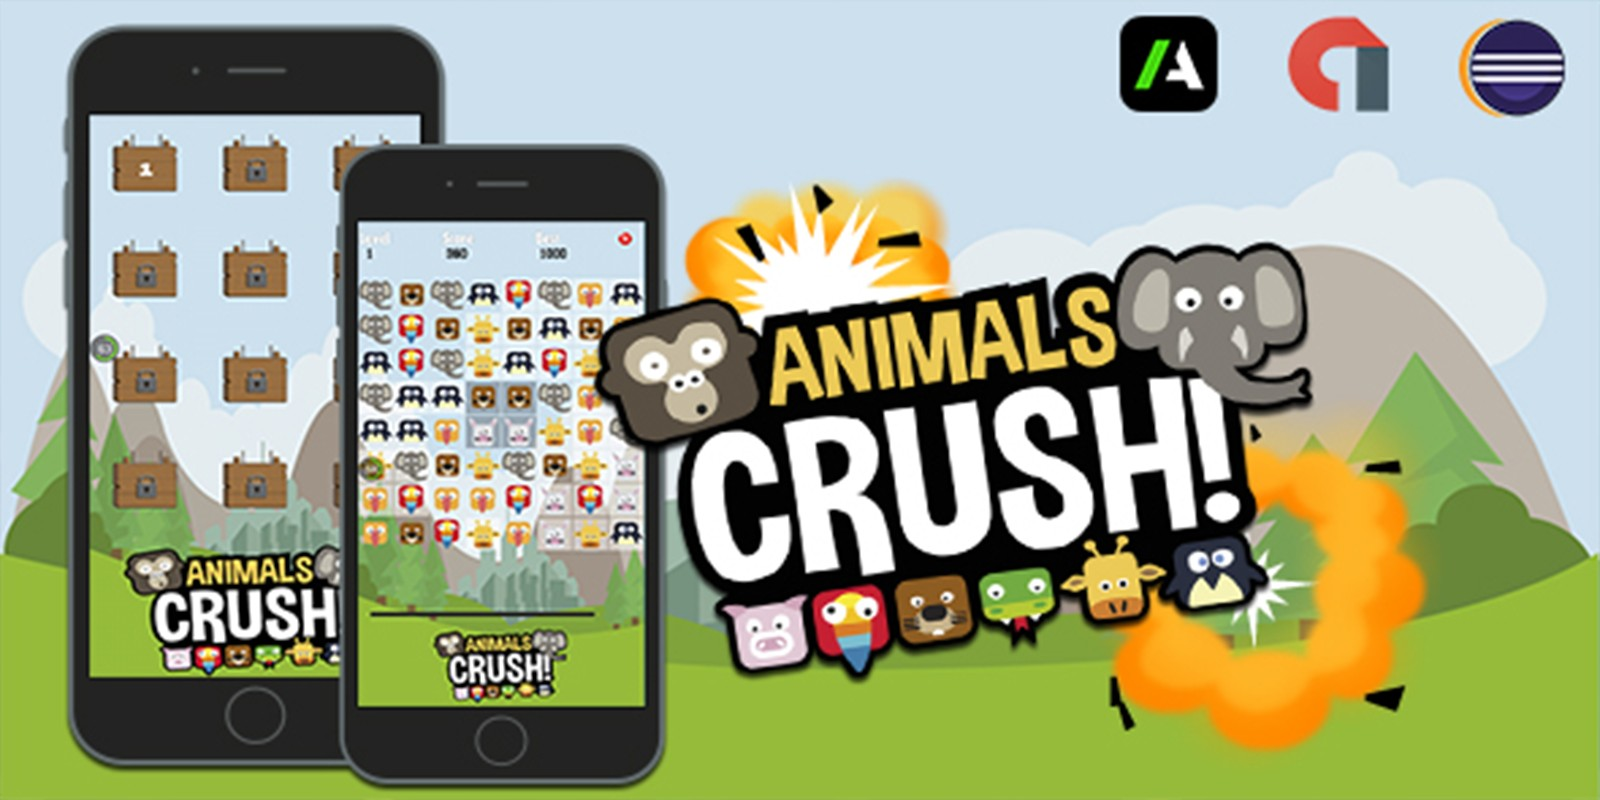 Animals Crush - Android Source Code